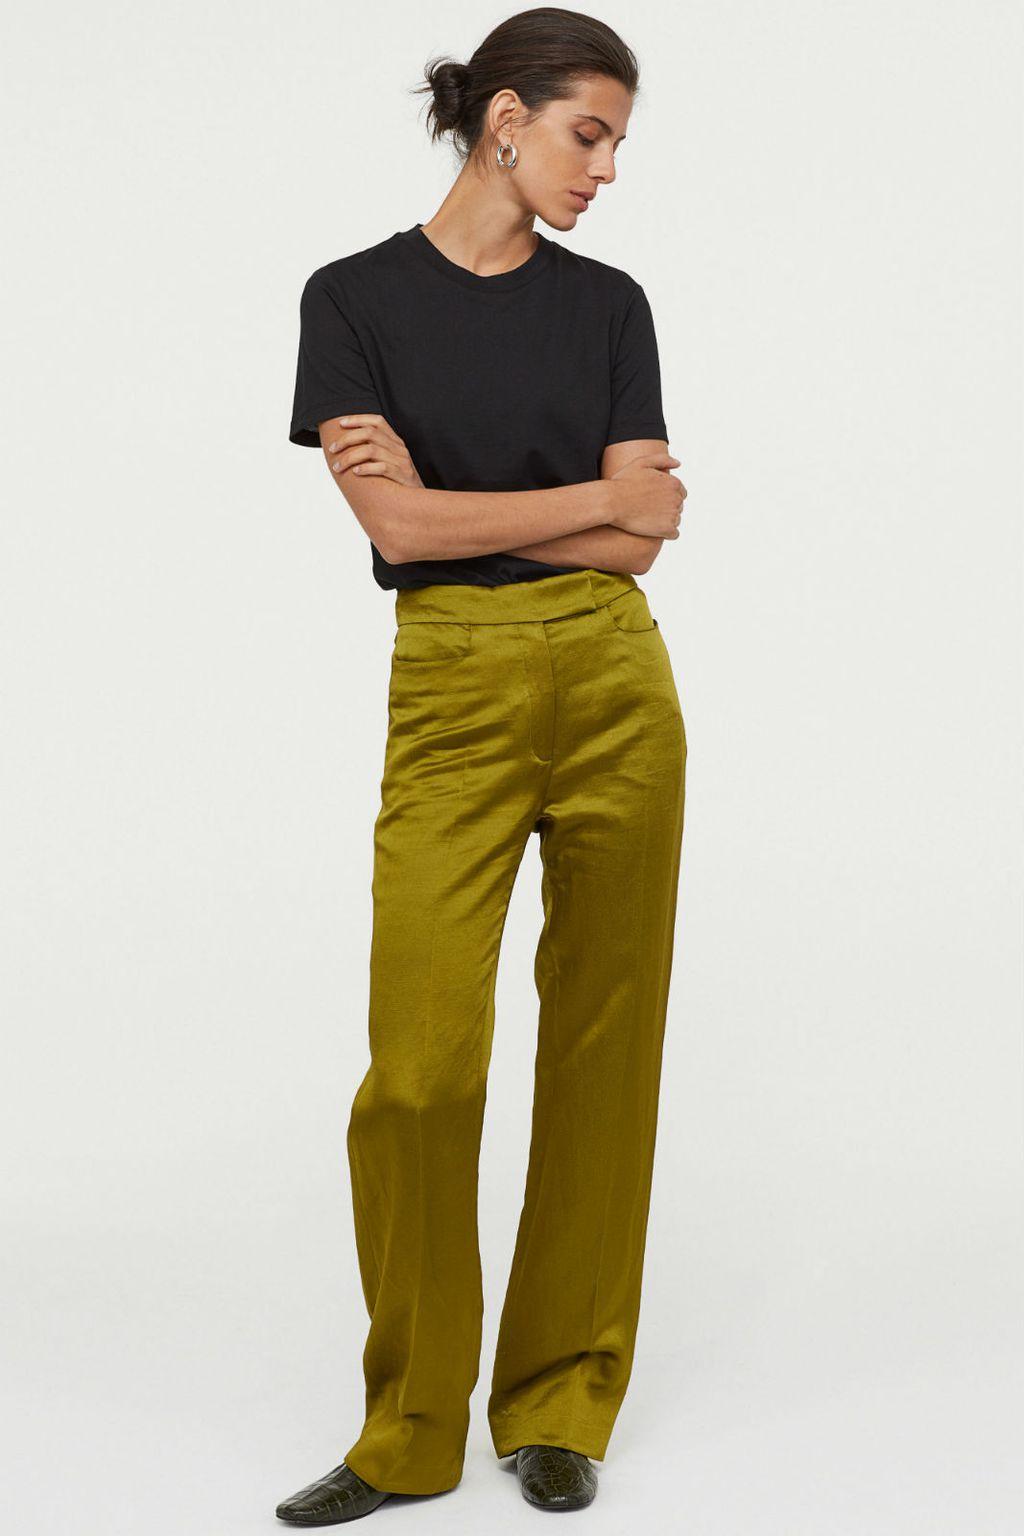 H&M hlače, 99 eura (737,40 kn)